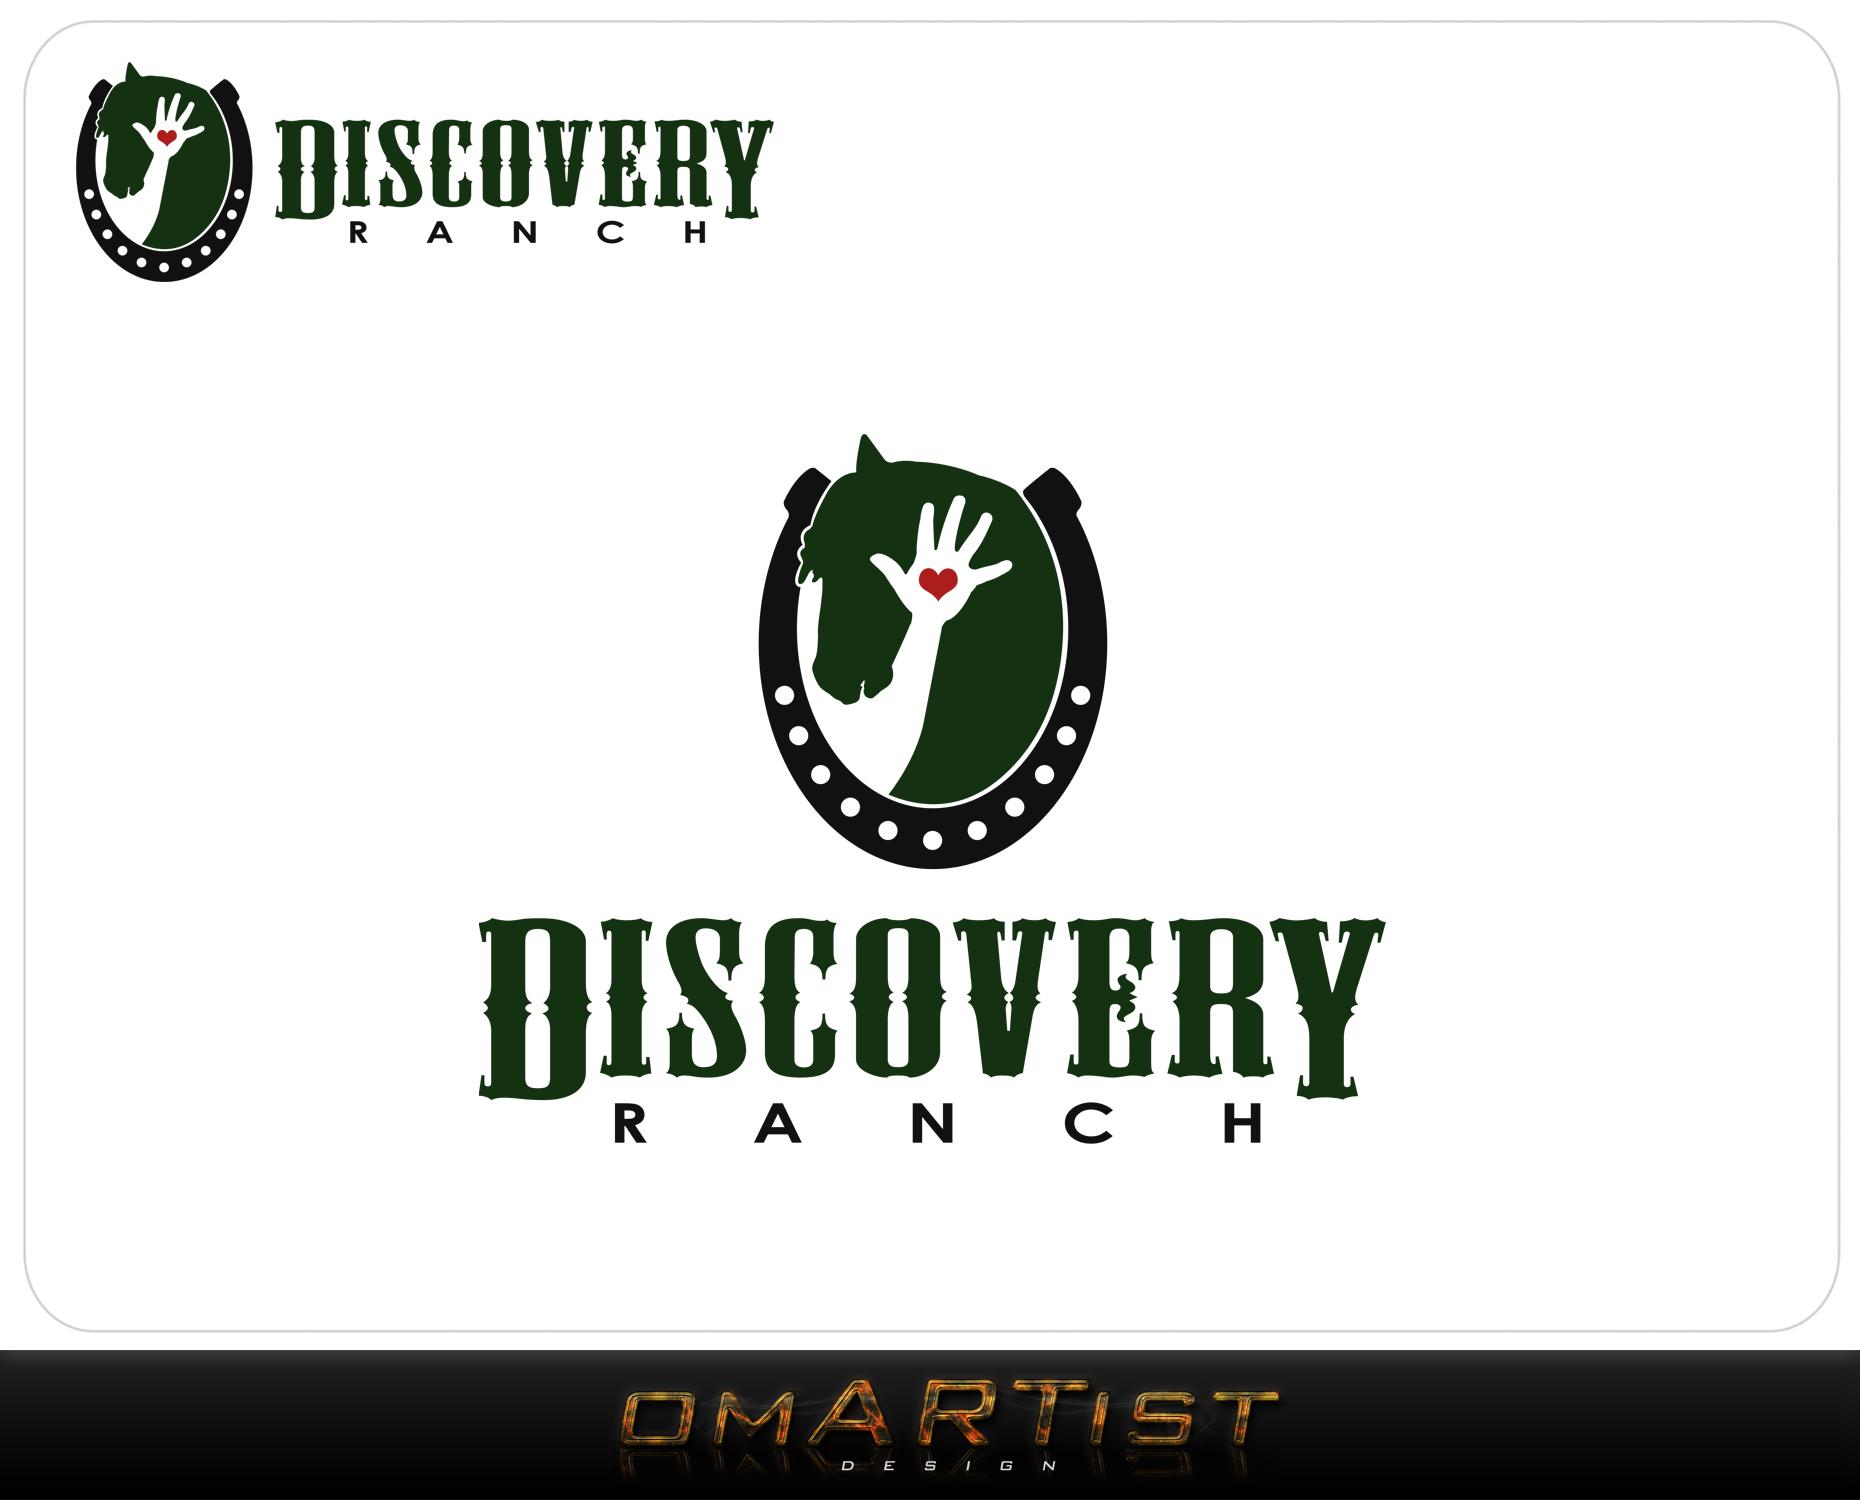 Logo Design by omARTist - Entry No. 79 in the Logo Design Contest Creative Logo Design for Discovery Ranch.